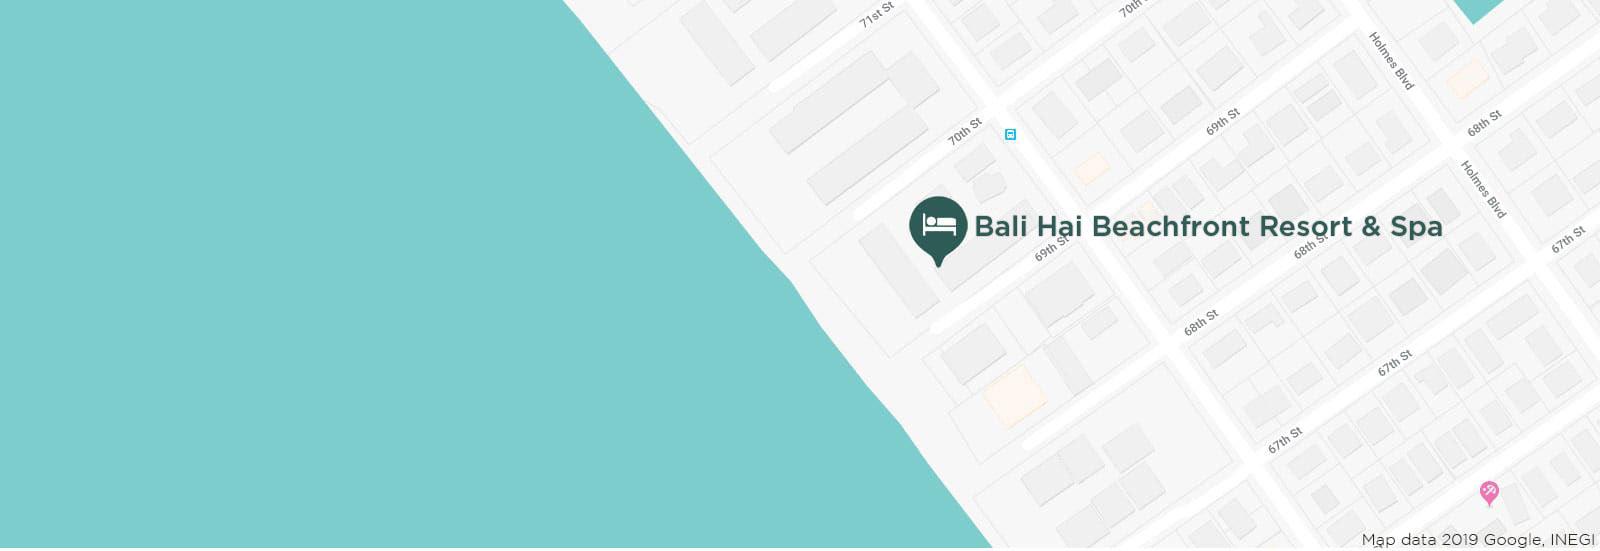 Bali Hai Beach Resort Vacation Rentals Location